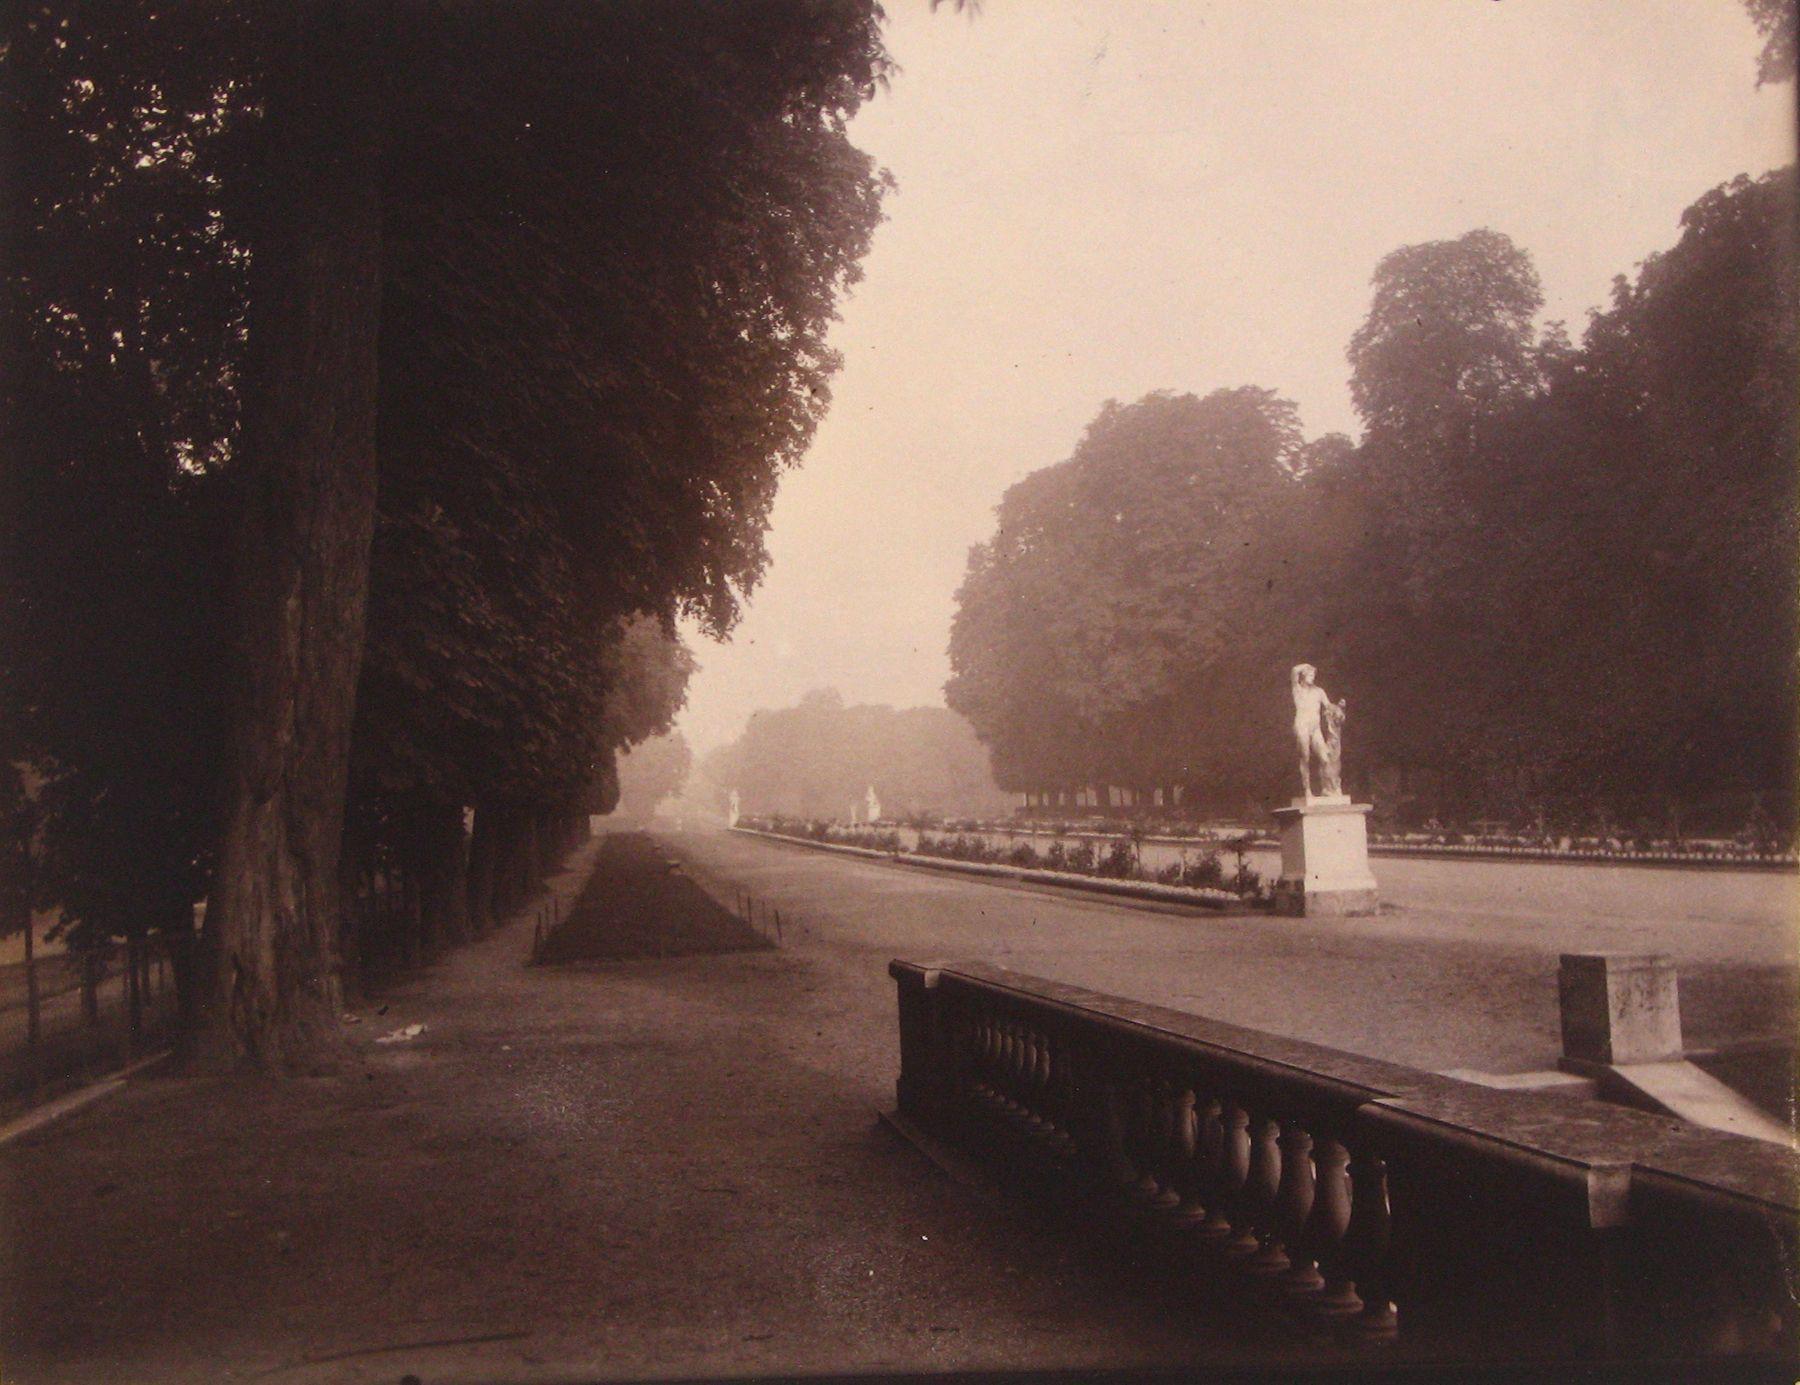 Eugene Atget - Saint-Cloud, 1924 - Howard Greenberg Gallery - 2018